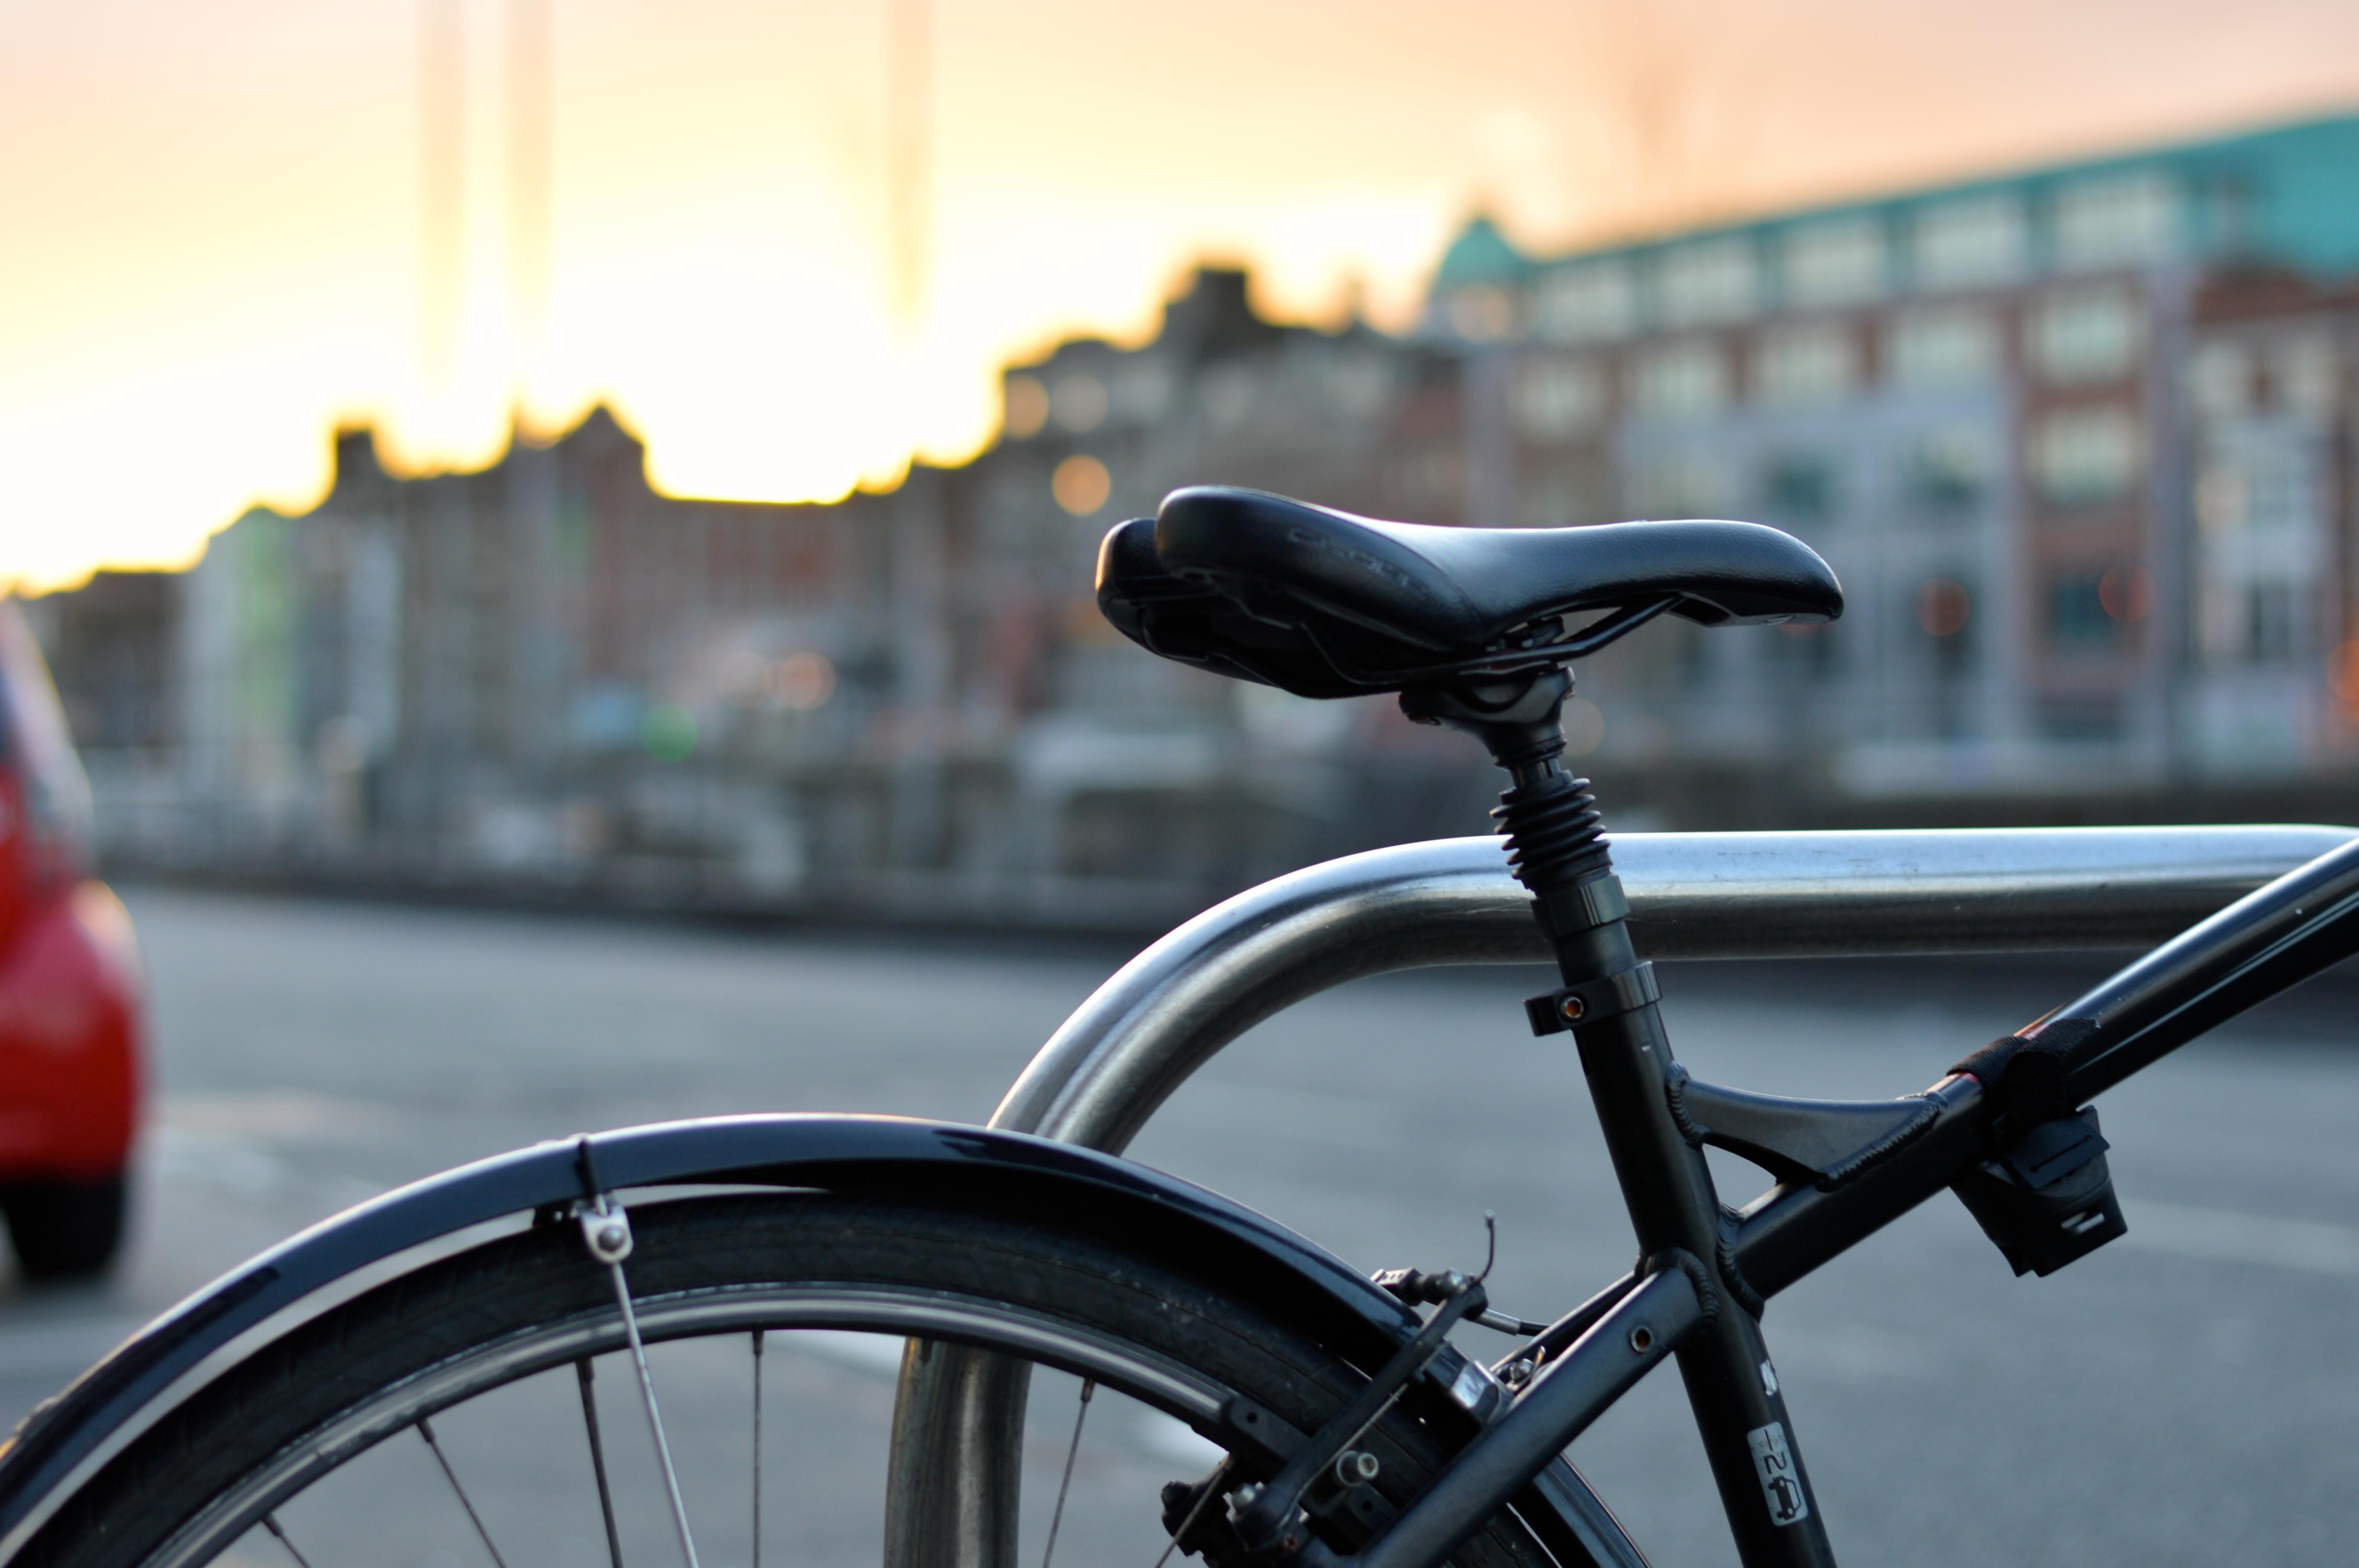 black mountain bike parked near the road